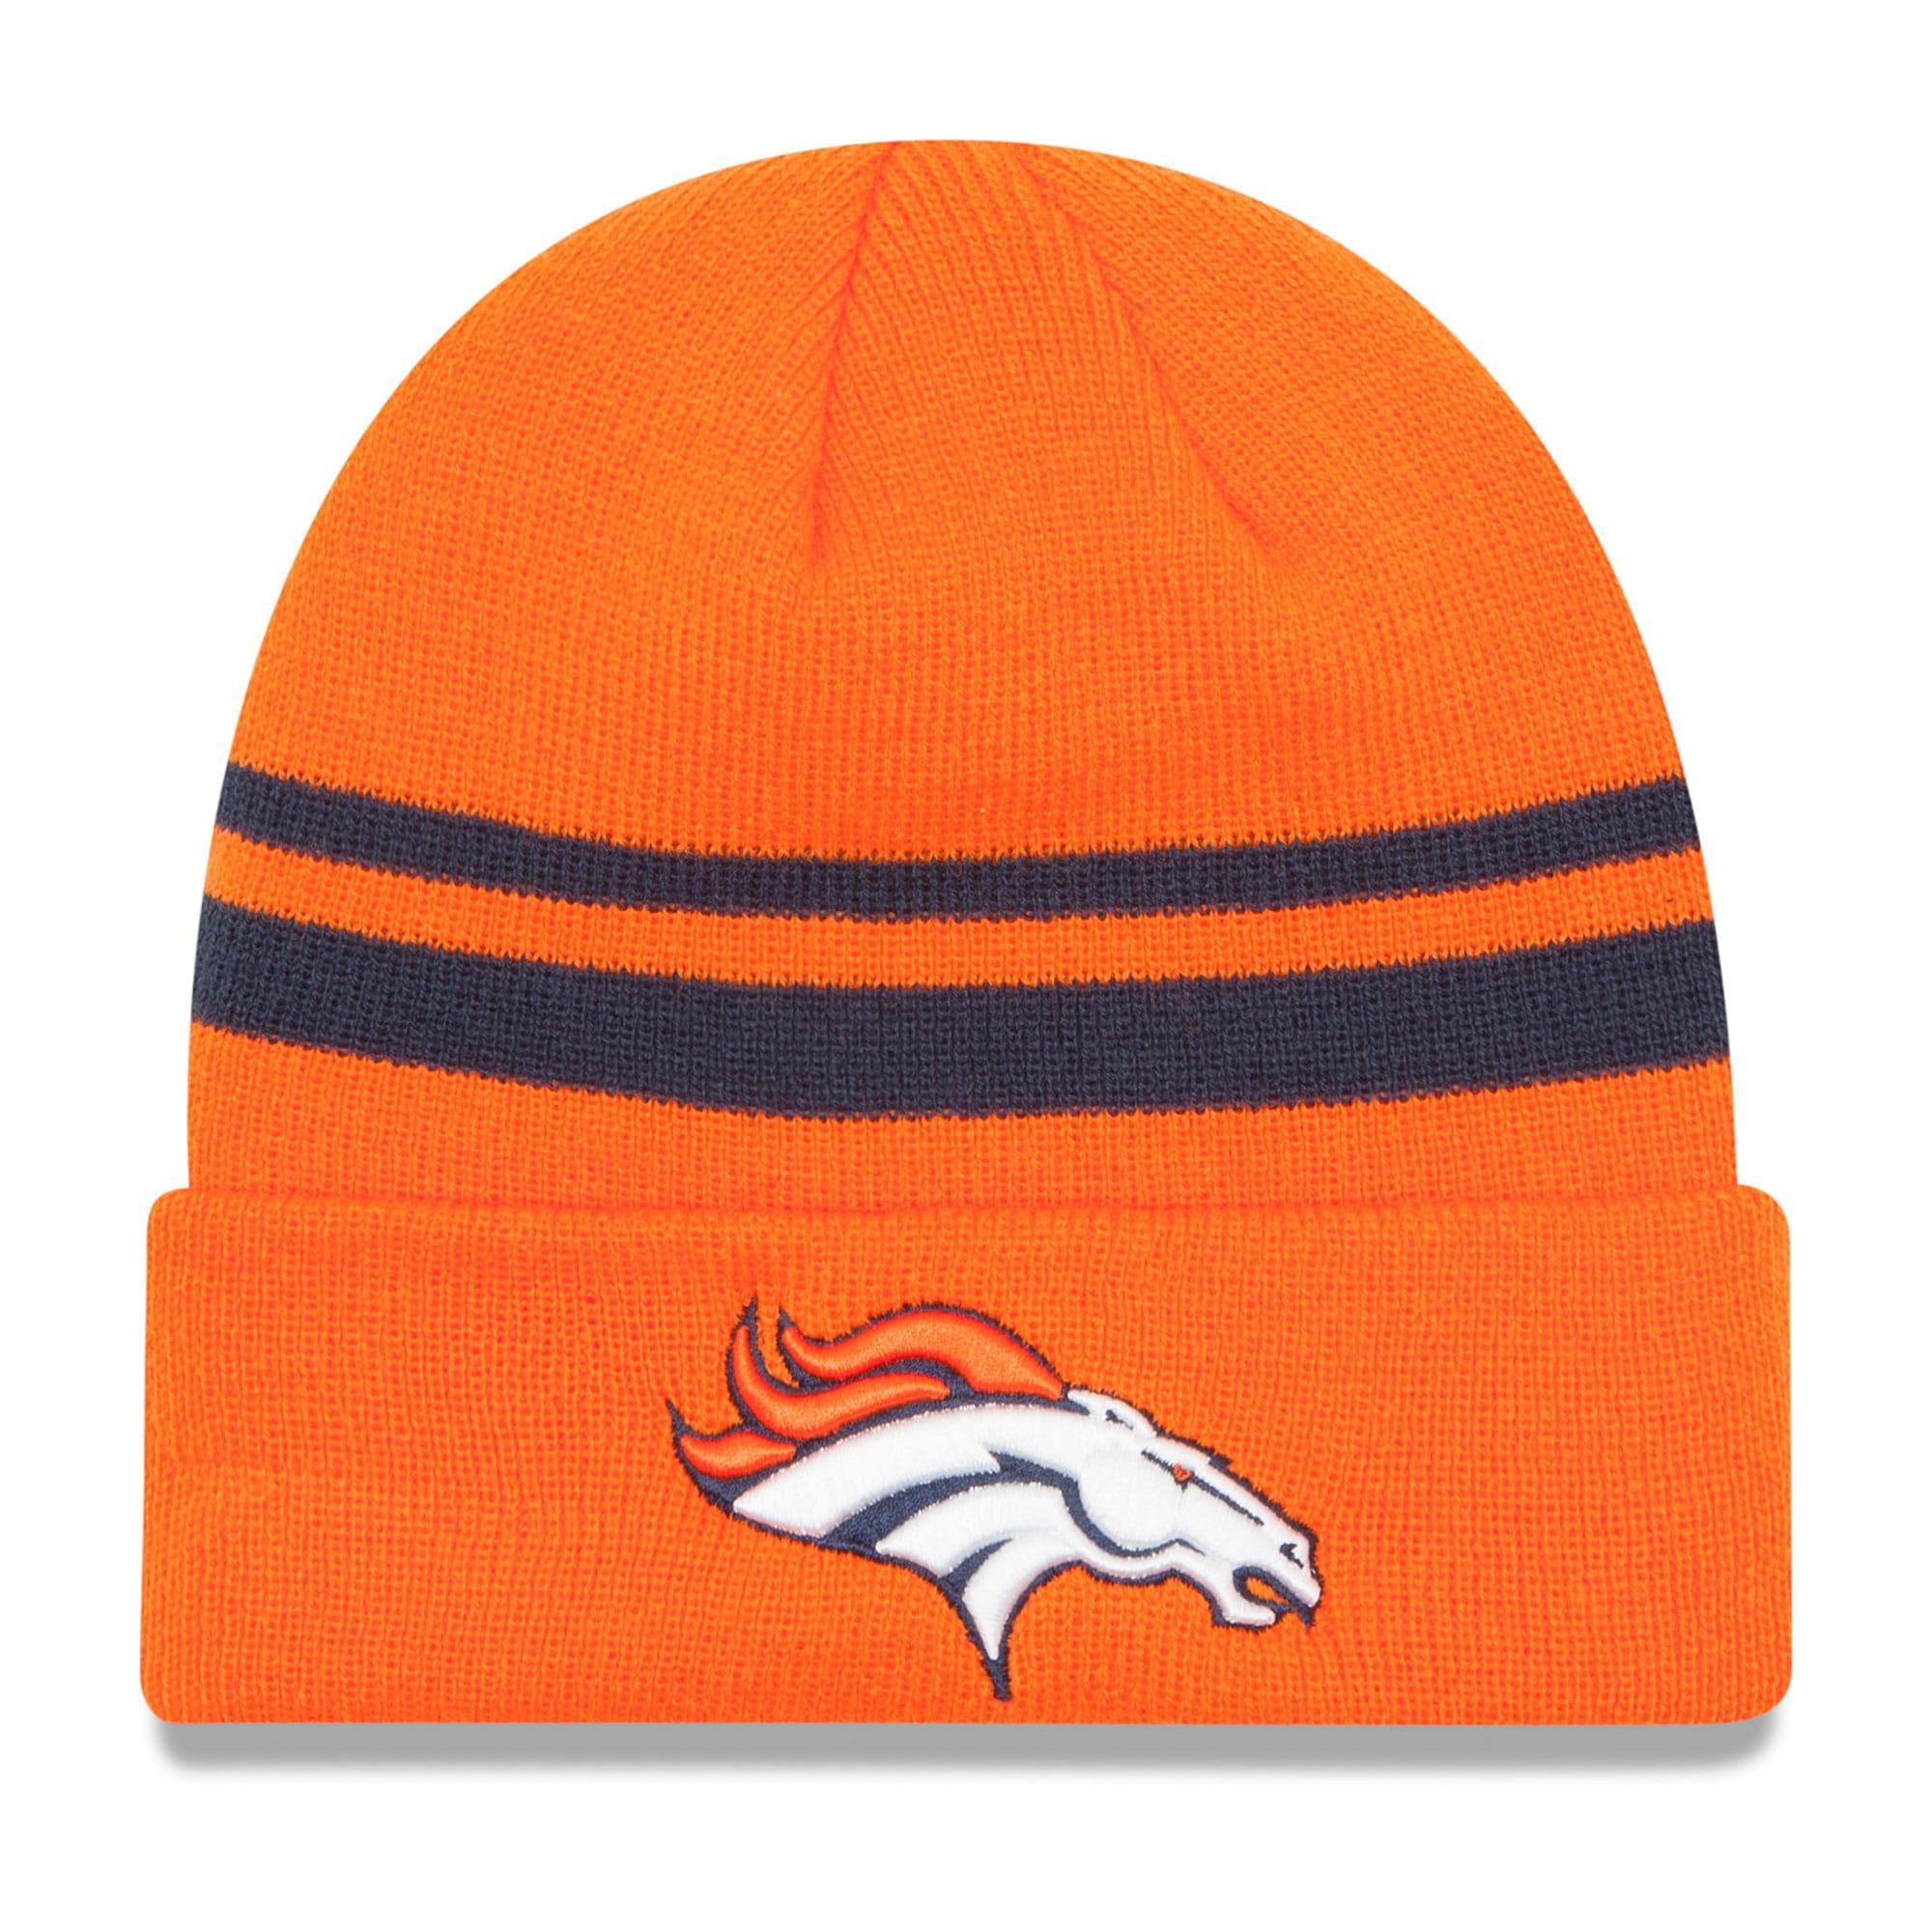 Denver Broncos New Era Team Logo Cuffed Knit Hat - Orange